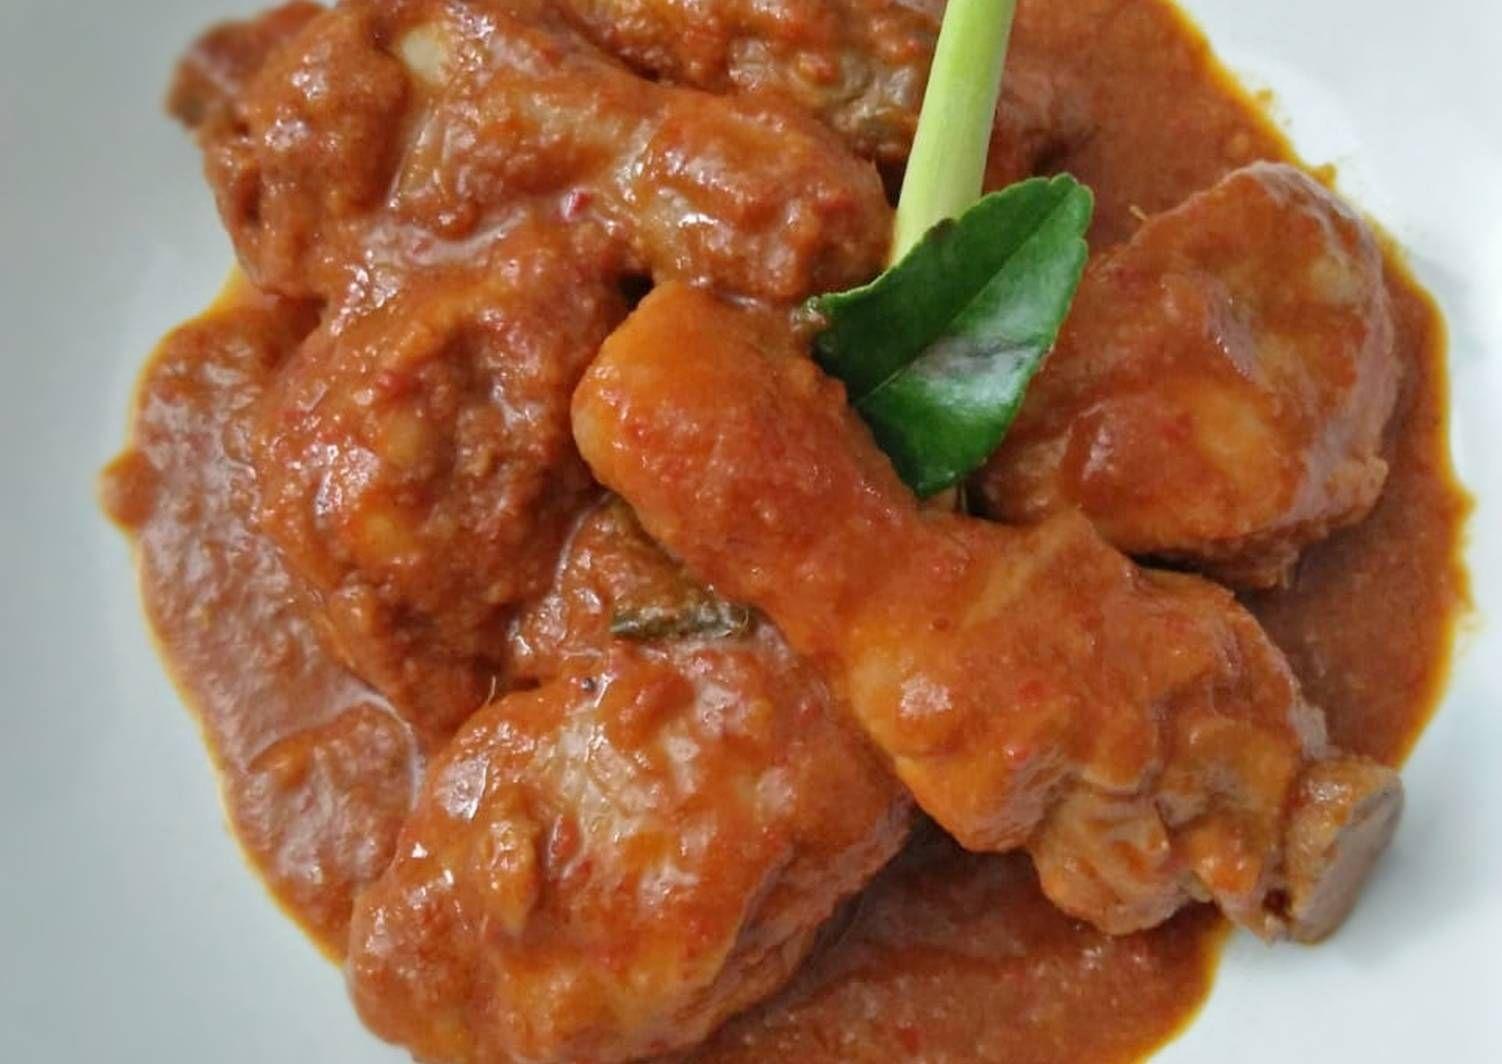 Resep Ayam Bumbu Merah Oleh Pitraratri Resep Resep Ayam Resep Ayam